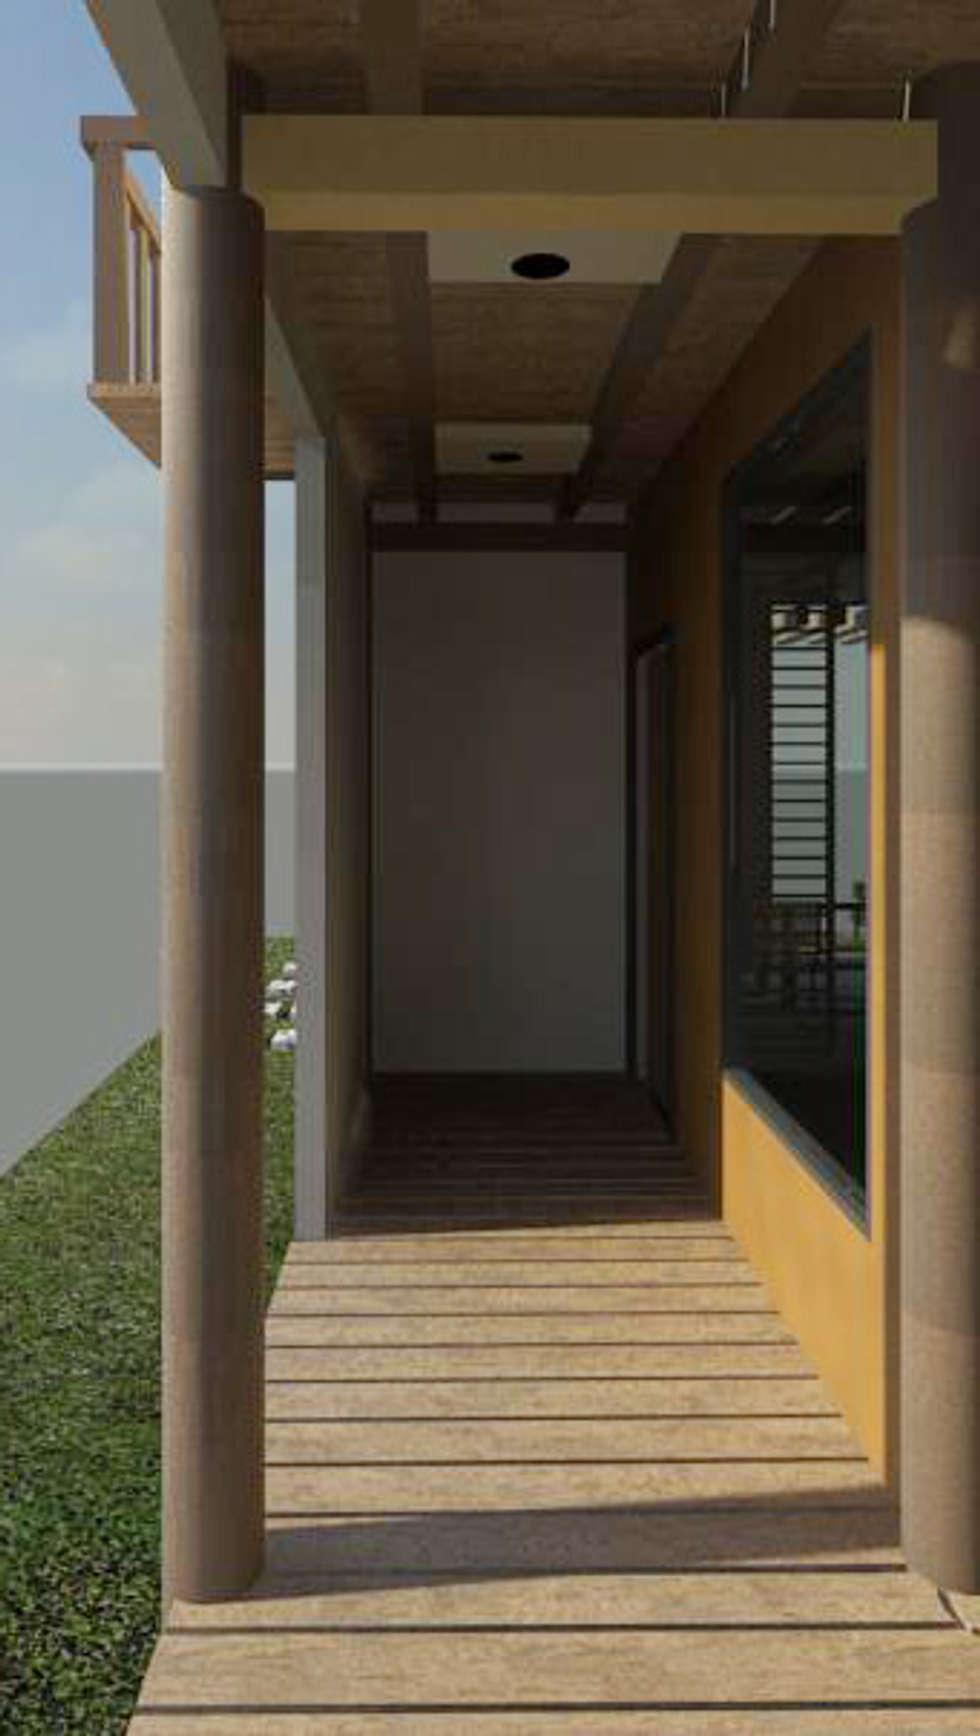 Vista acceso a la vivienda: Casas de estilo minimalista por Loft 5101 F.P.